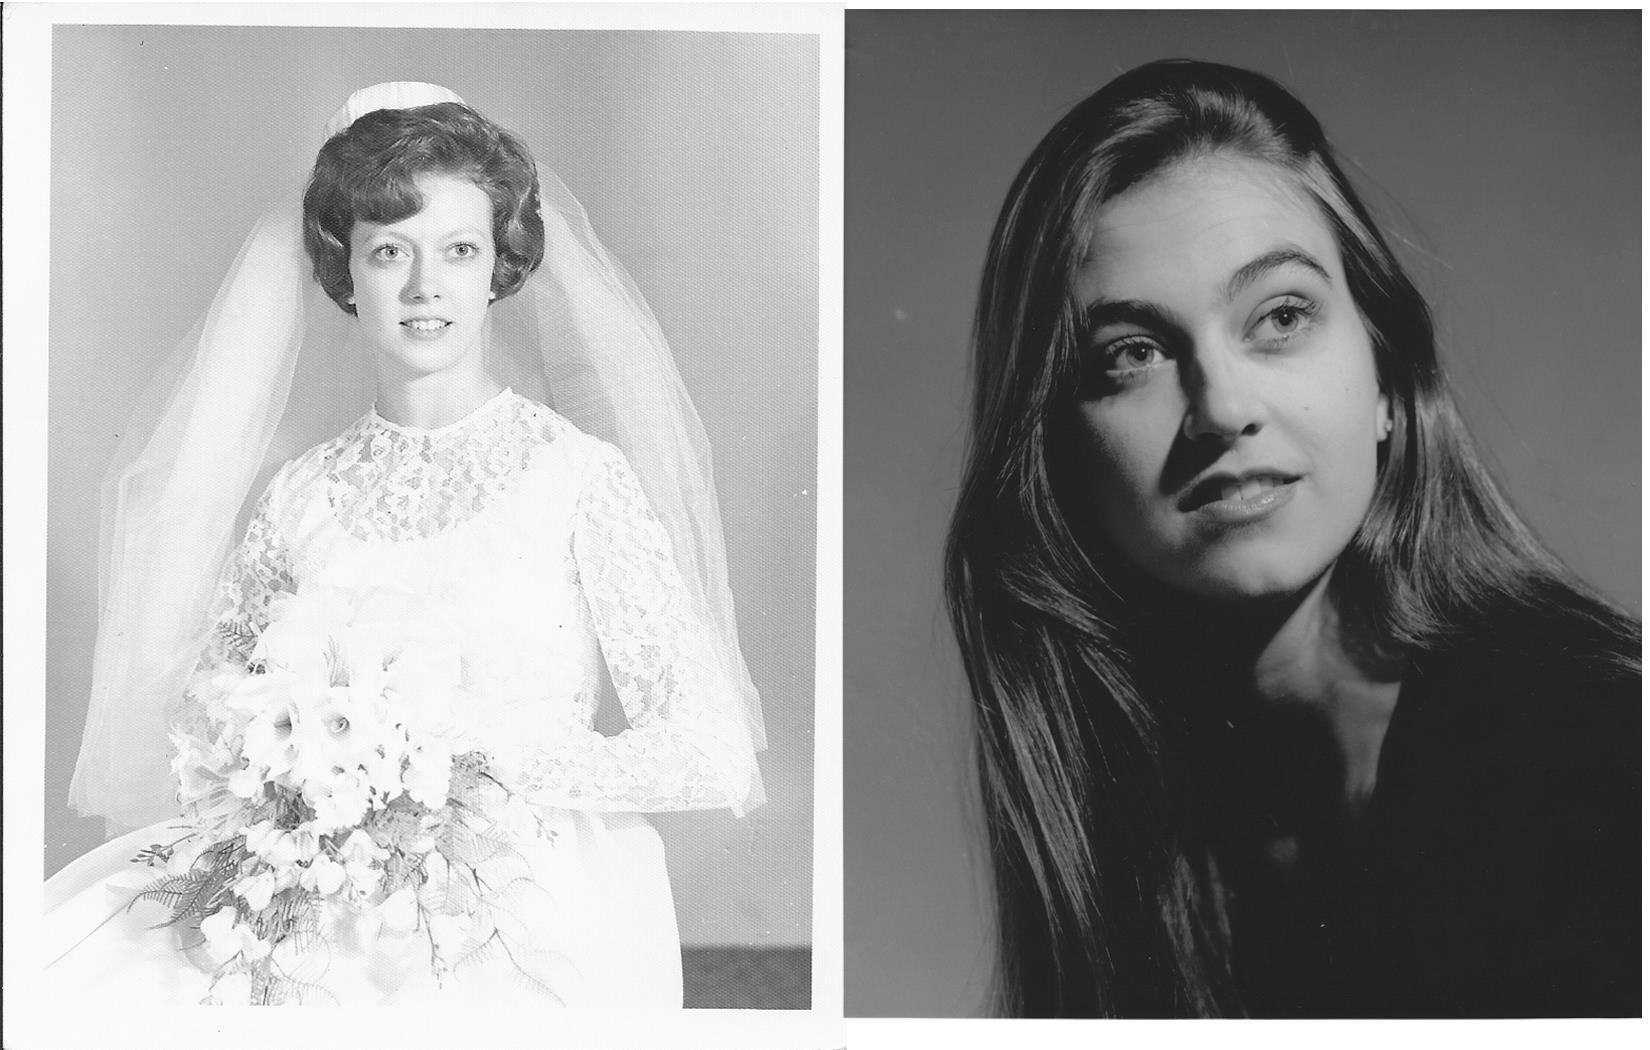 Pat Camper (at 18) and Brooks Ann Camper (at 20).